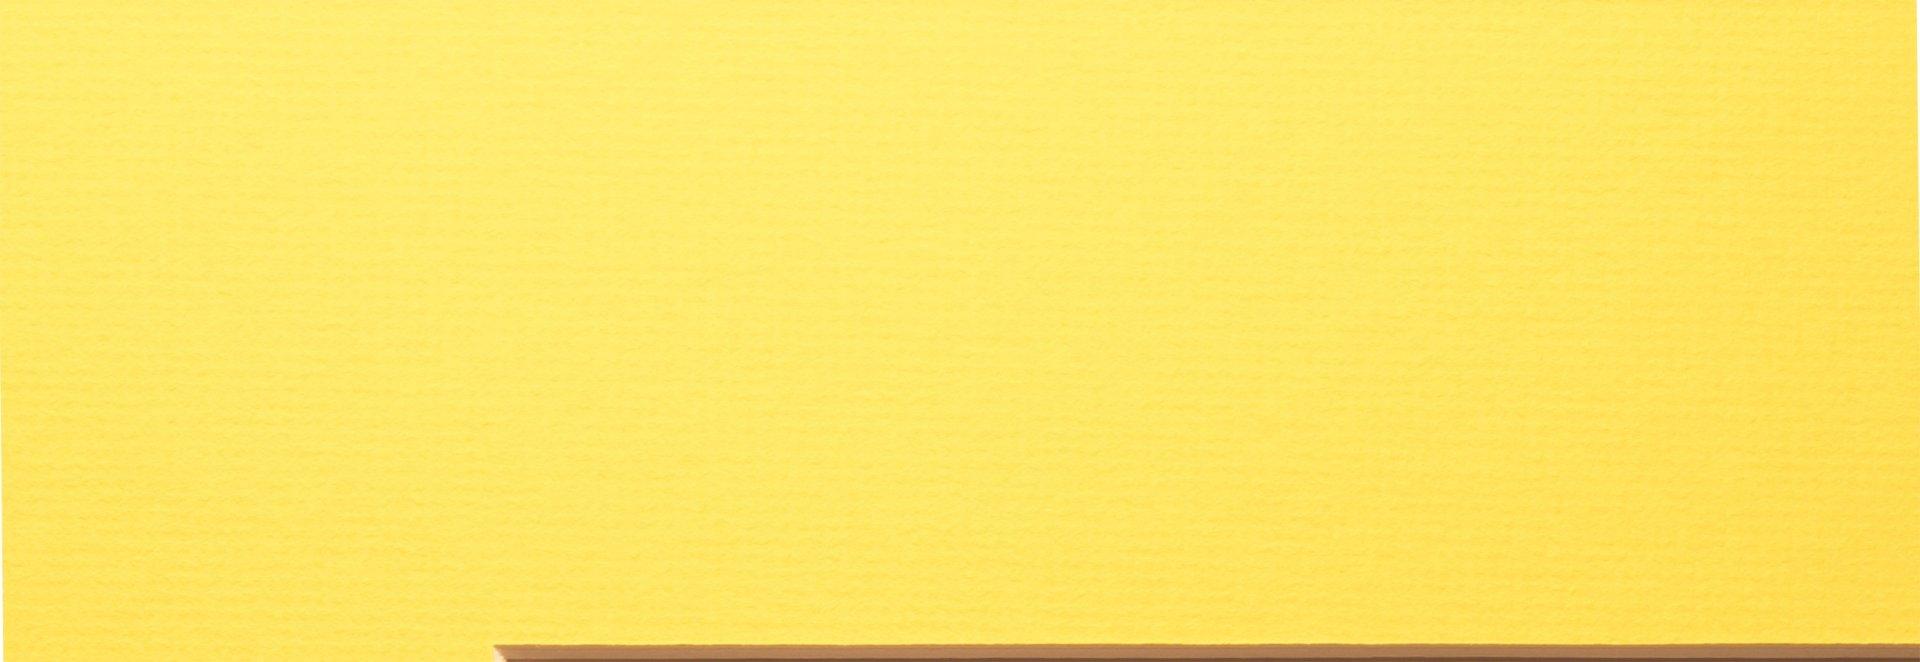 GSRM902_G902 Yellow